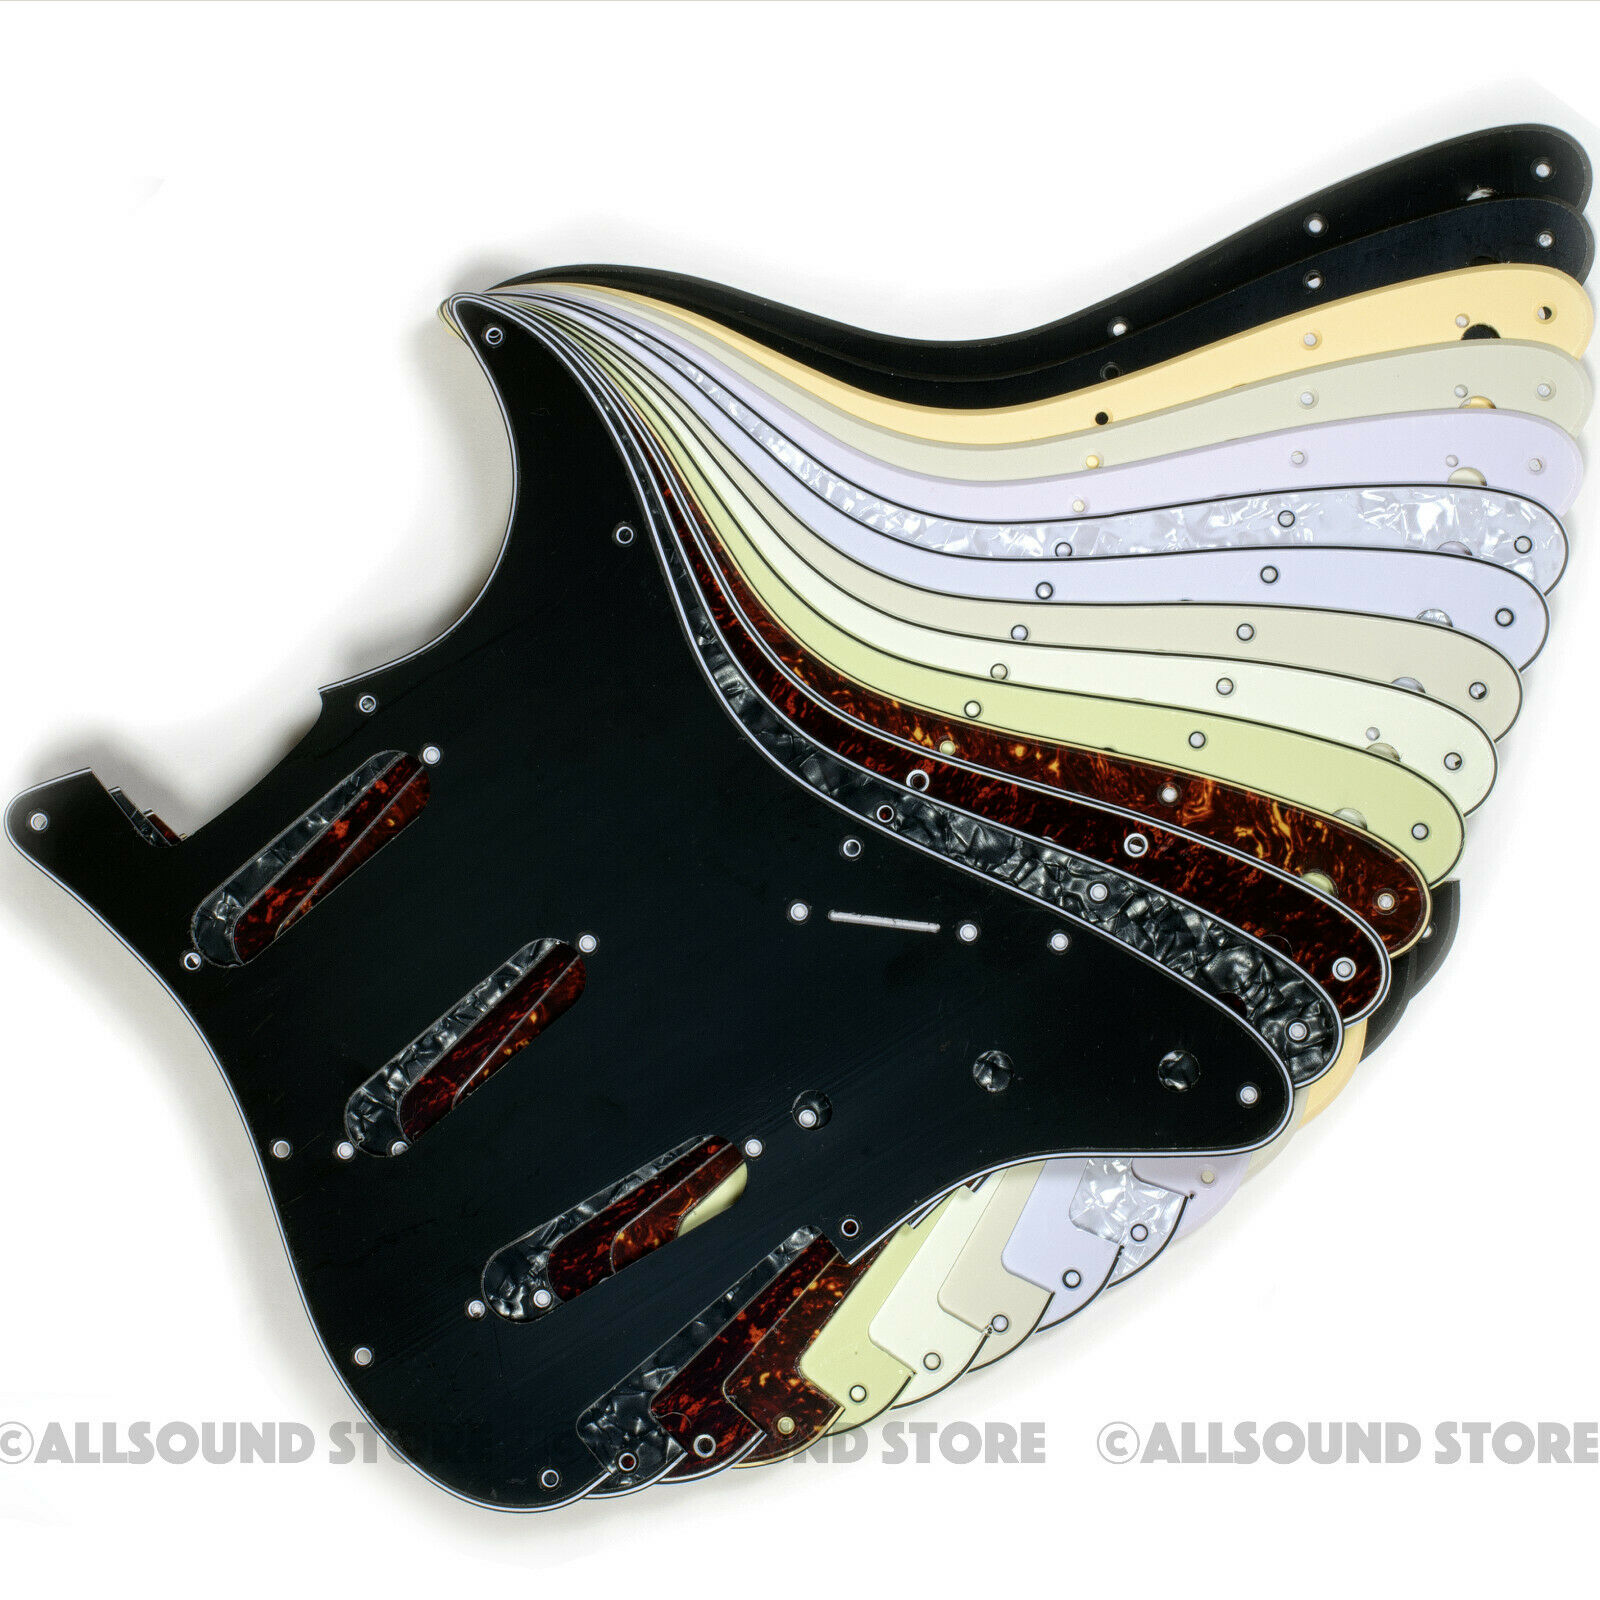 *NEW Alnico 5 LOADED PICKGUARD for Fender Strat Black 3 Ply 8 Hole *NON BEVELED*